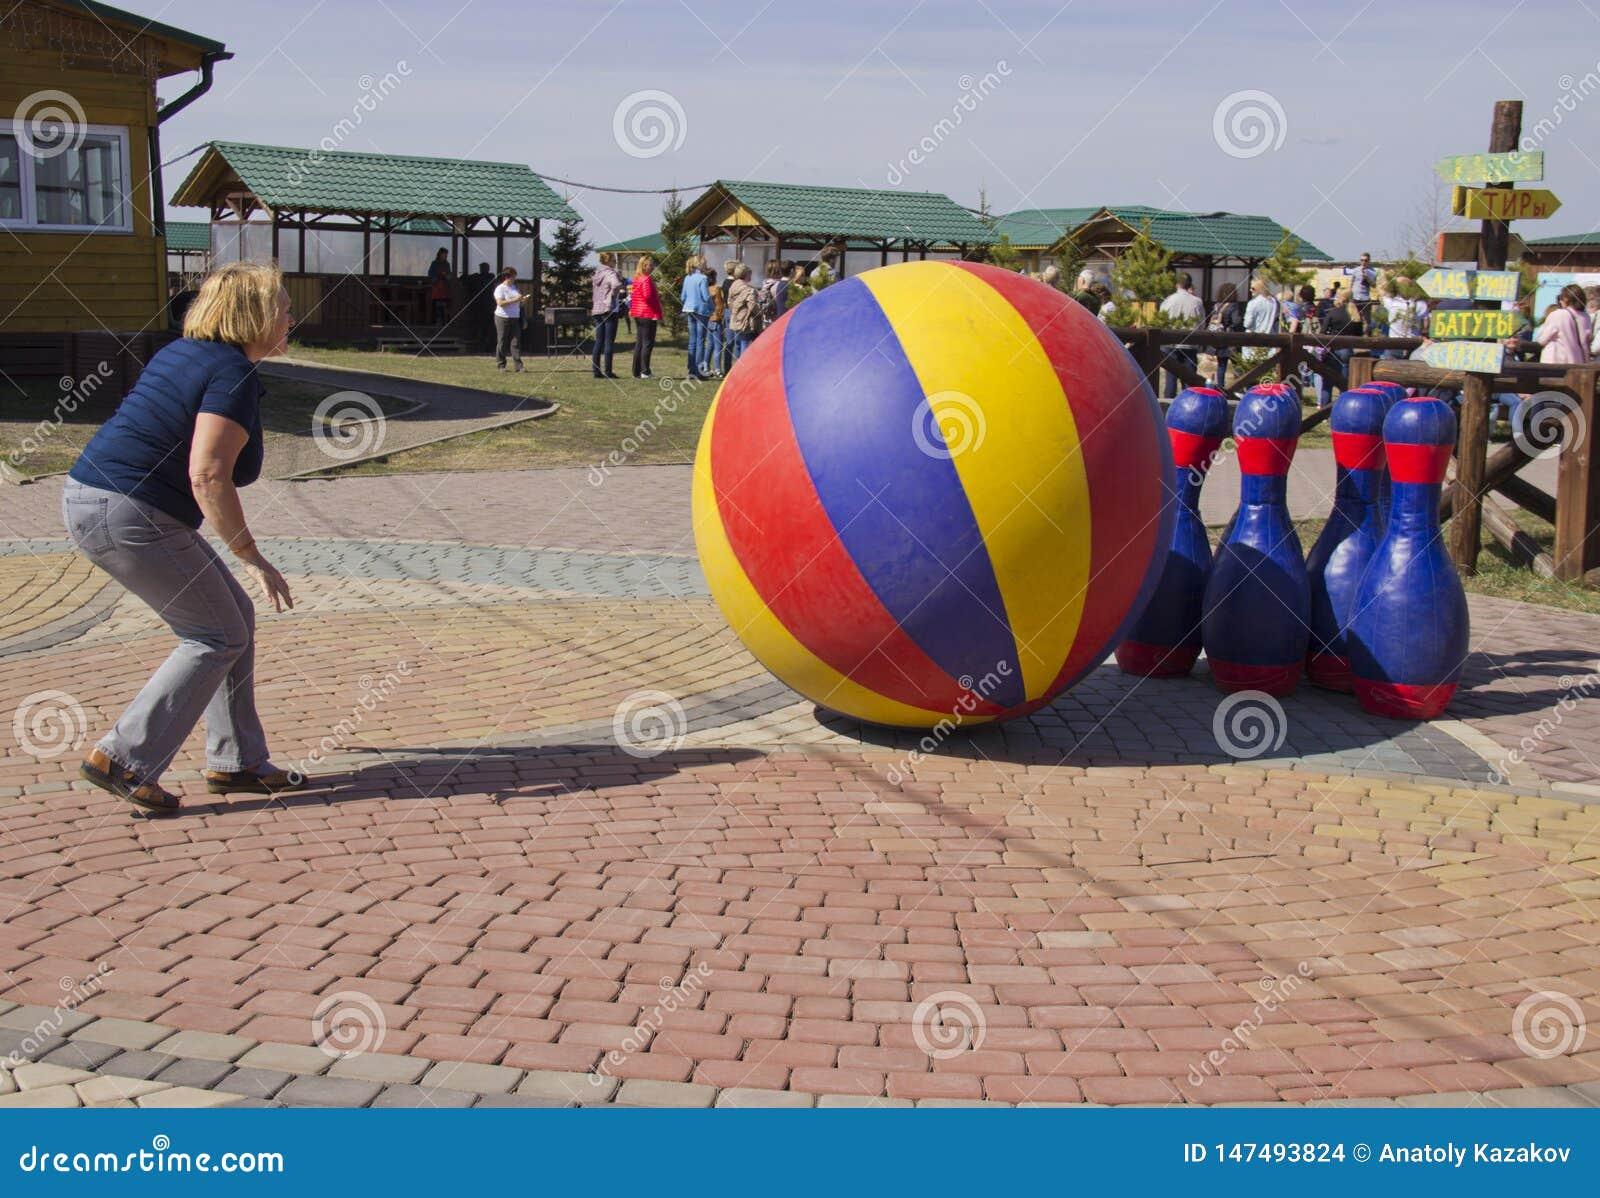 A mulher bate os pinos da bola